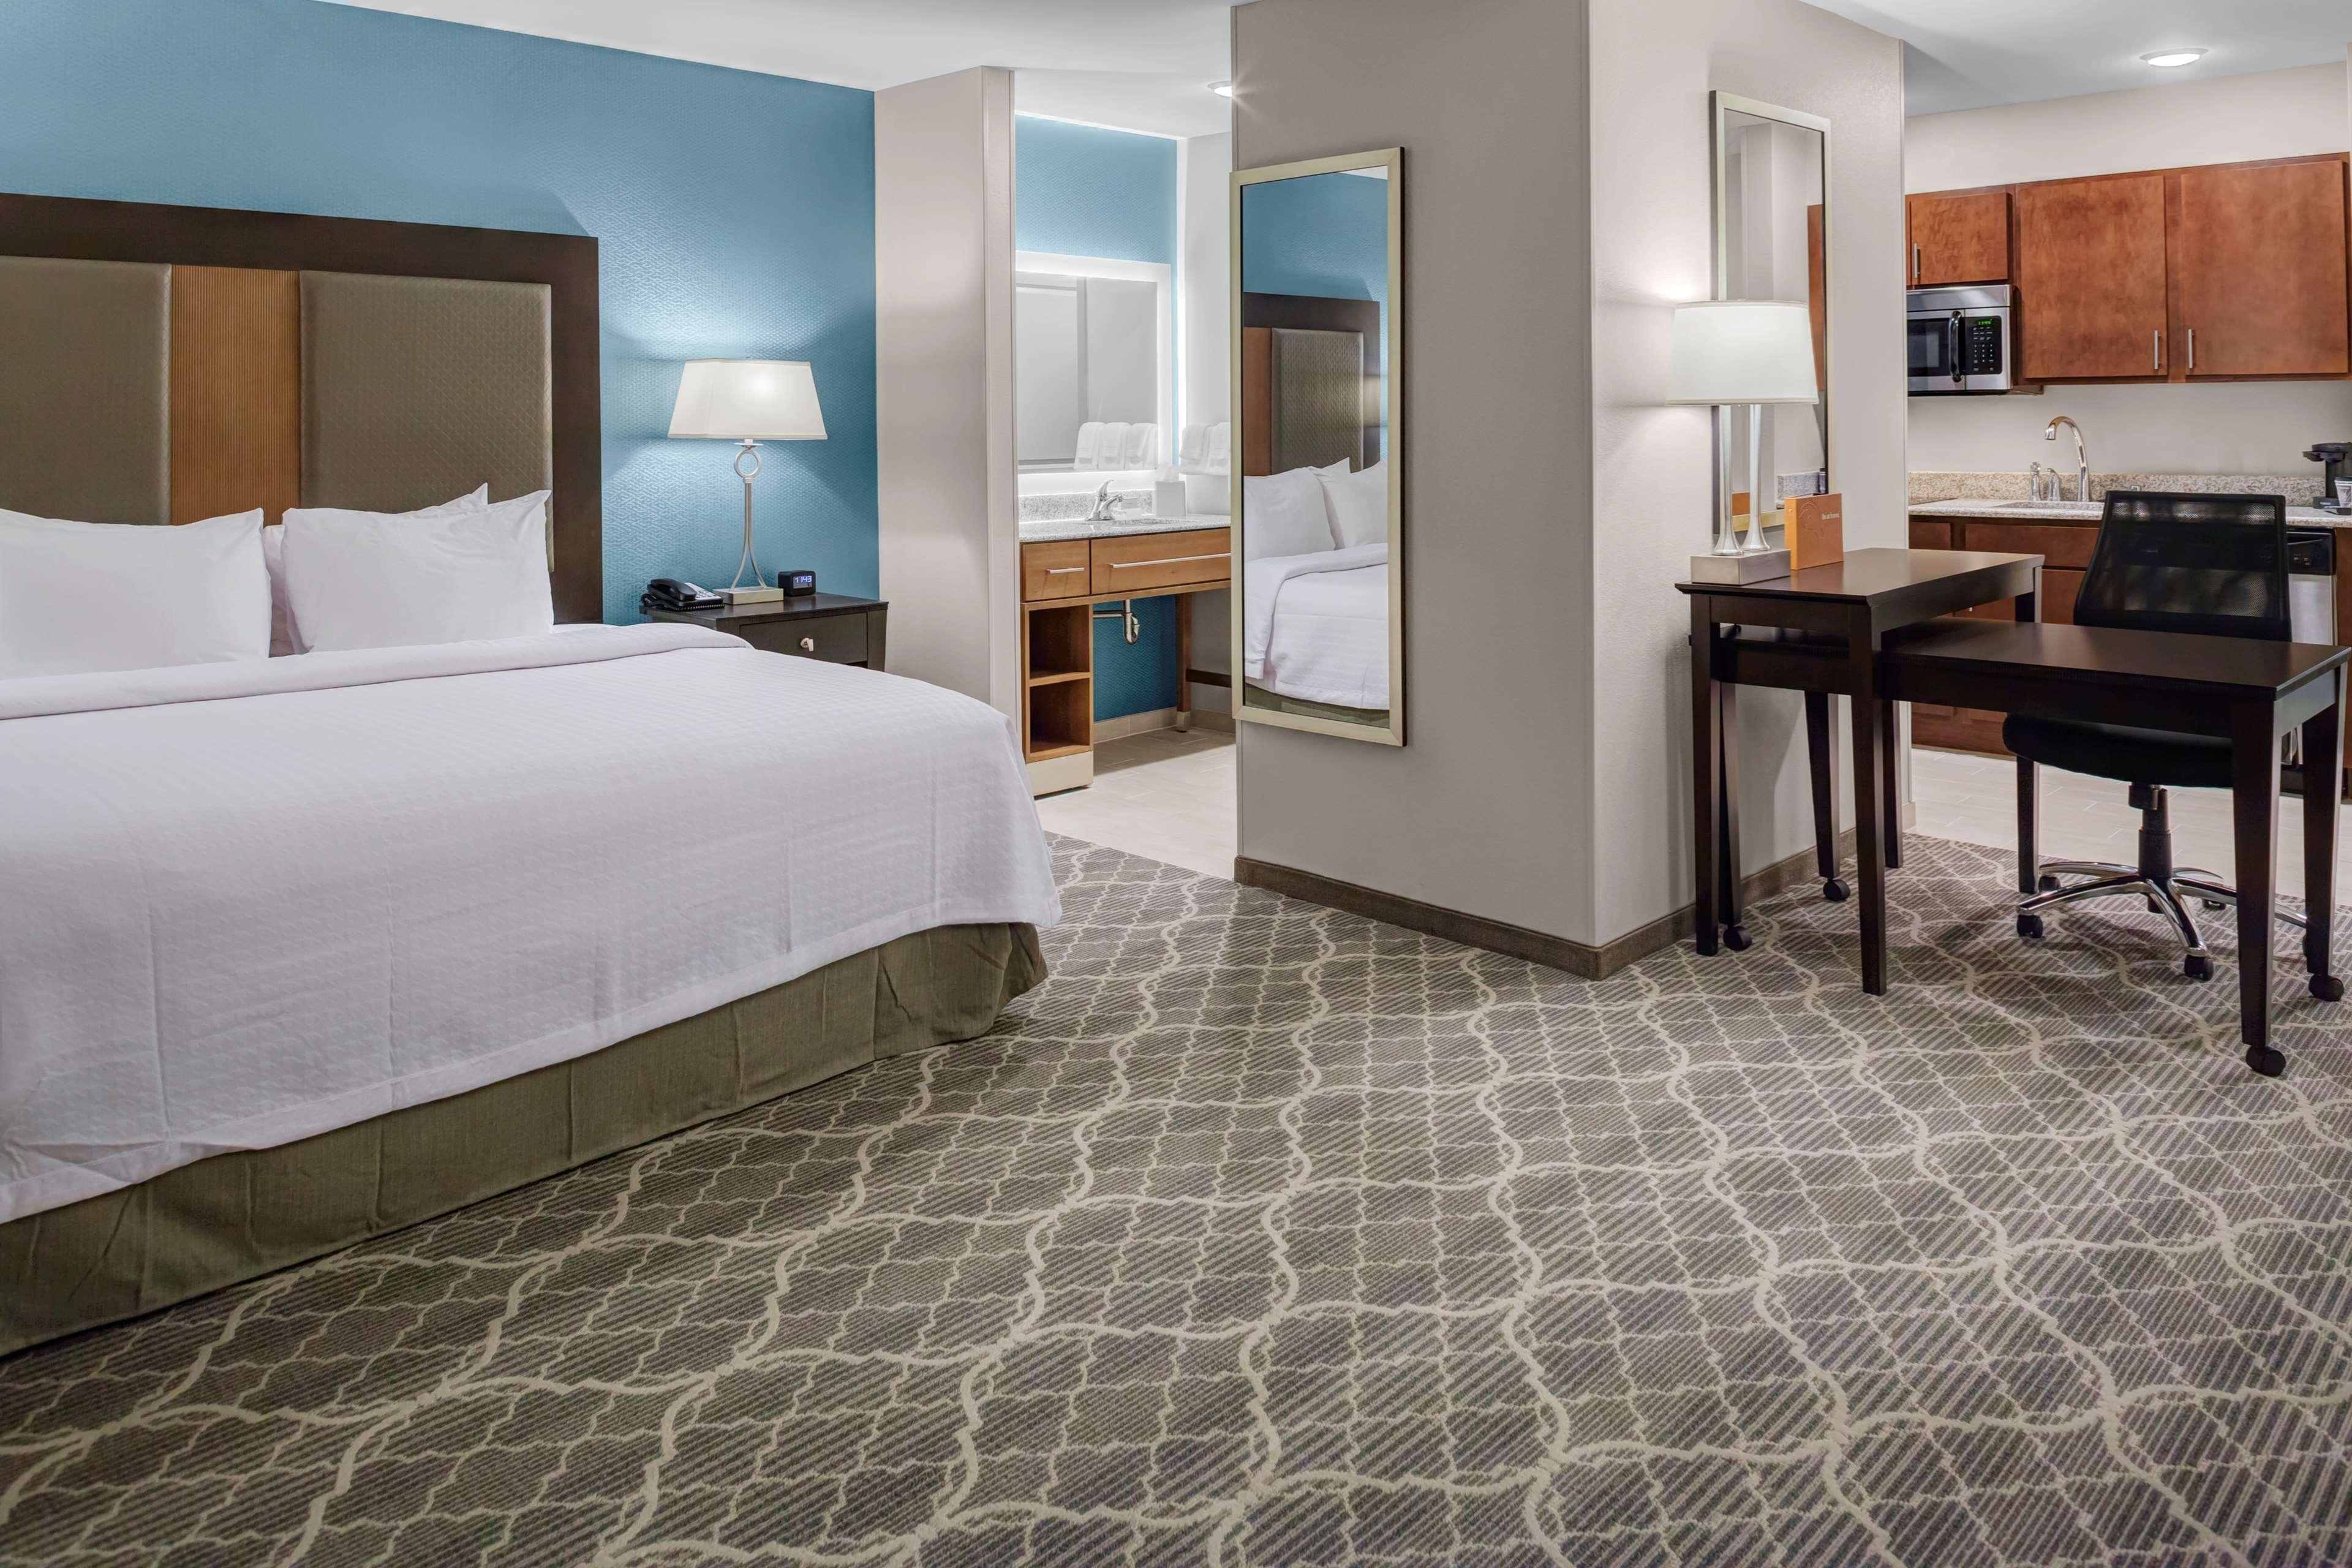 Homewood Suites by Hilton Wauwatosa Milwaukee image 13